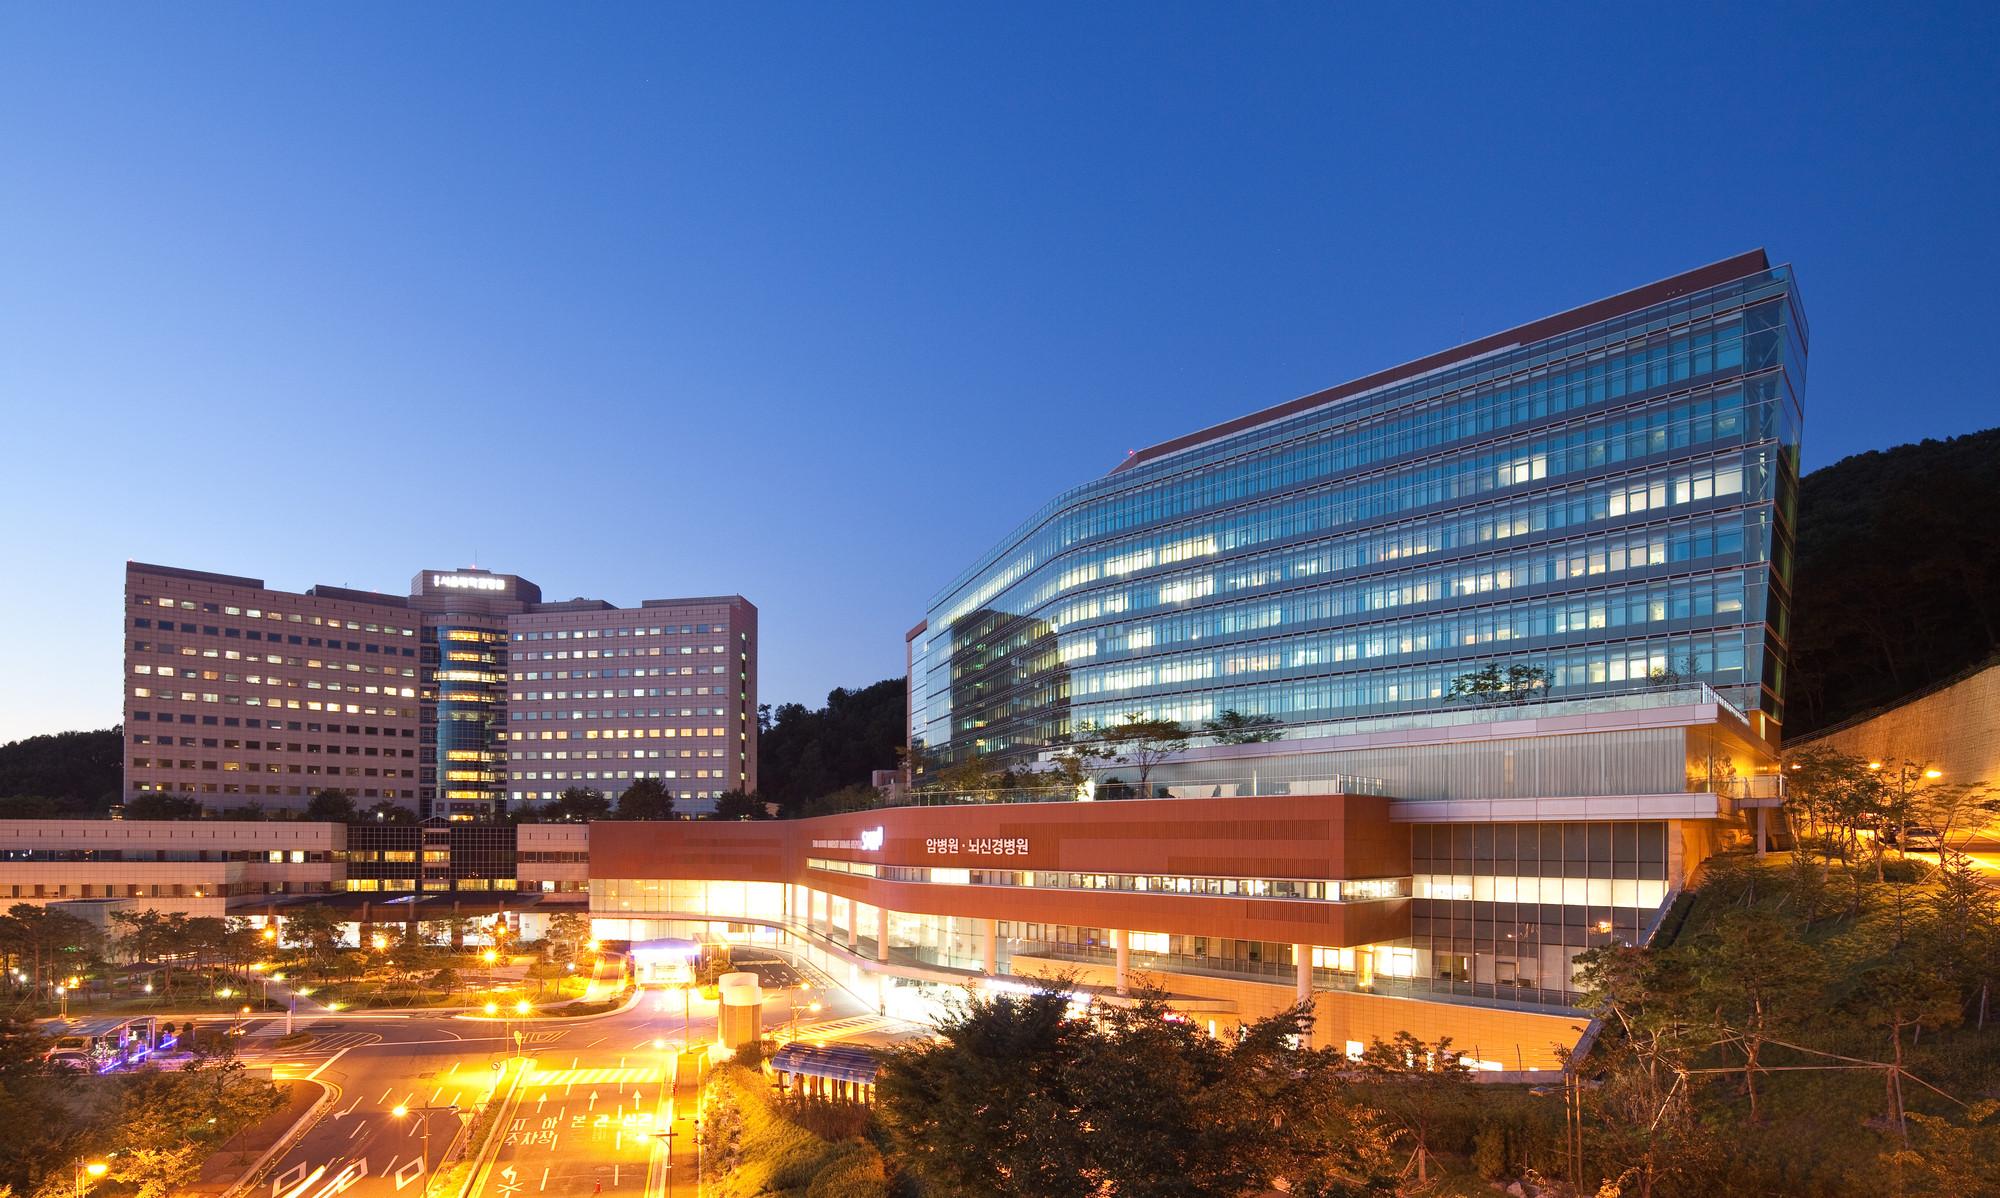 Gallery Of Bundang Seoul National University Hospital